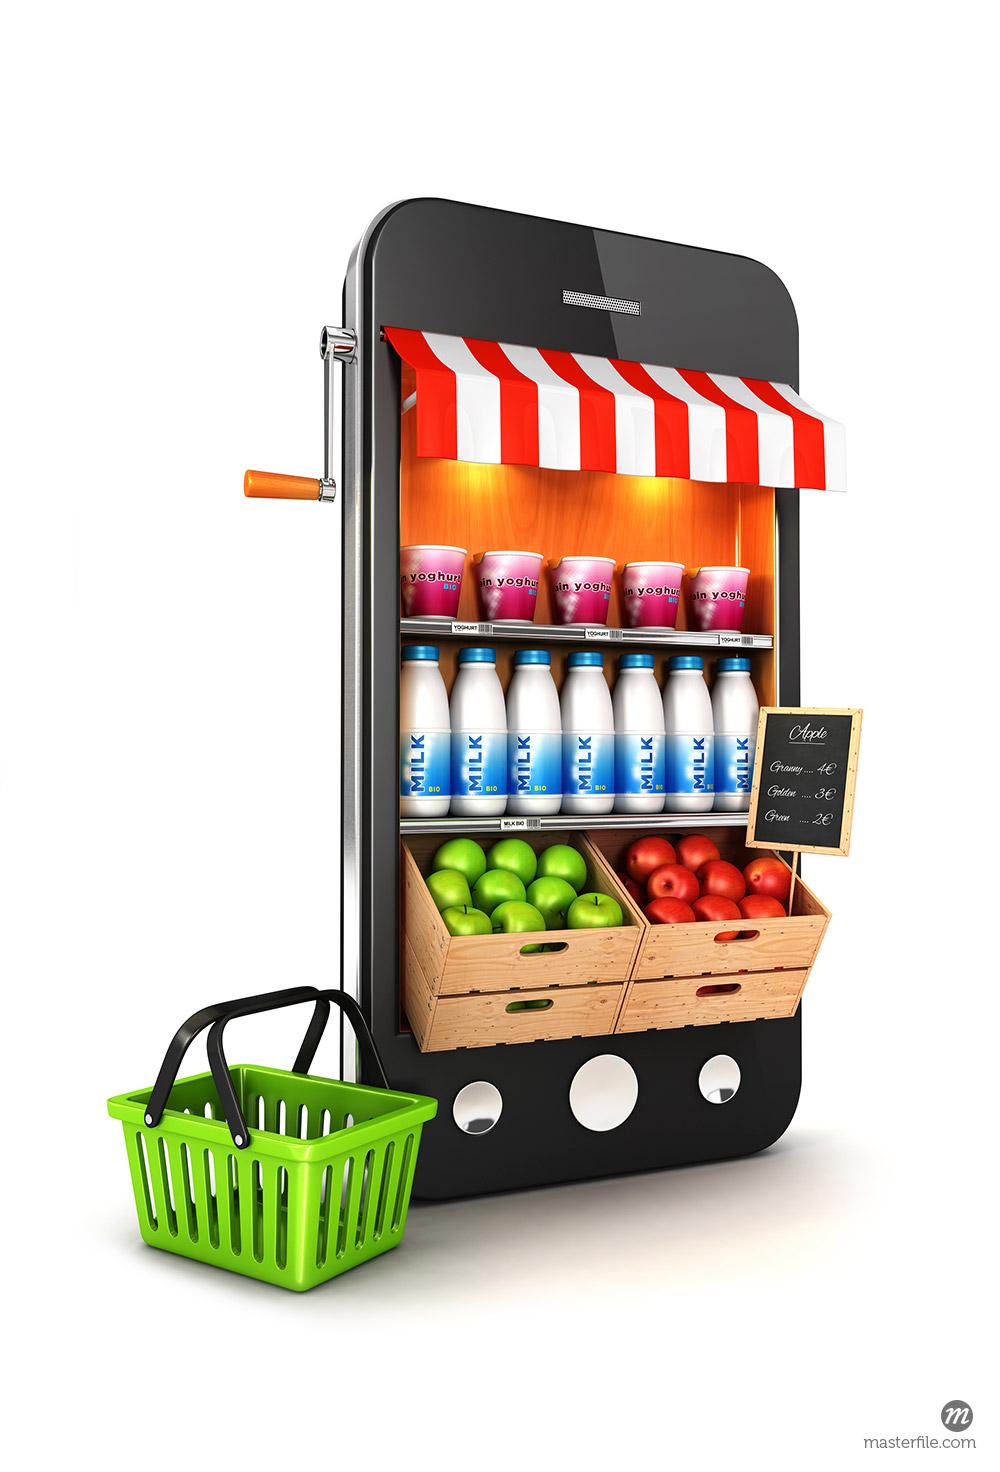 3d supermarket smartphone © 3dmask / Masterfile